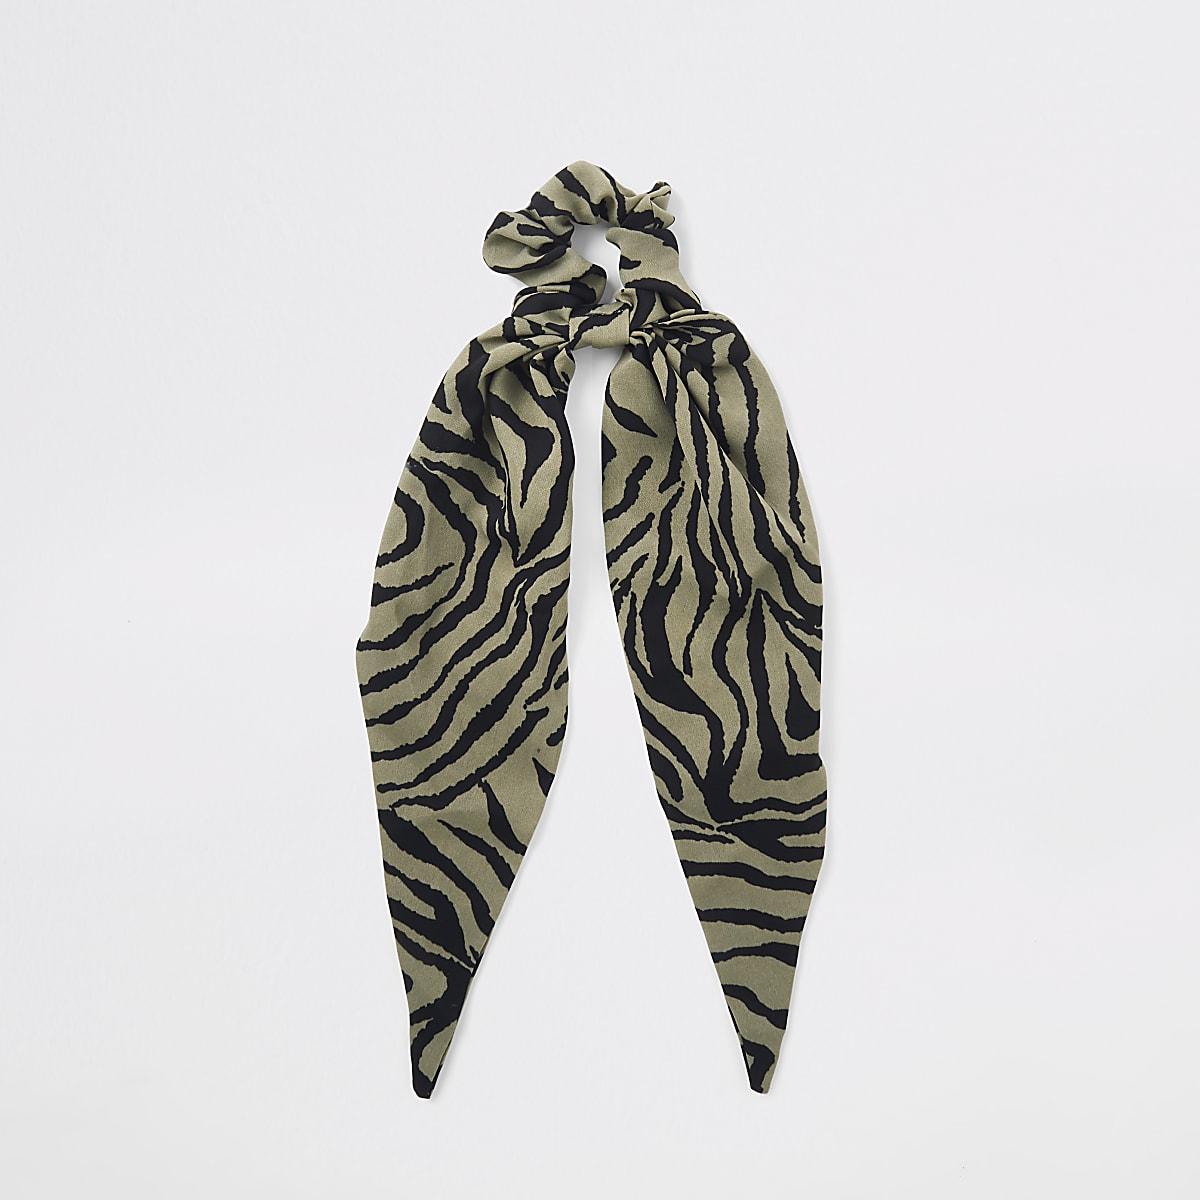 Green zebra print scarf scrunchie